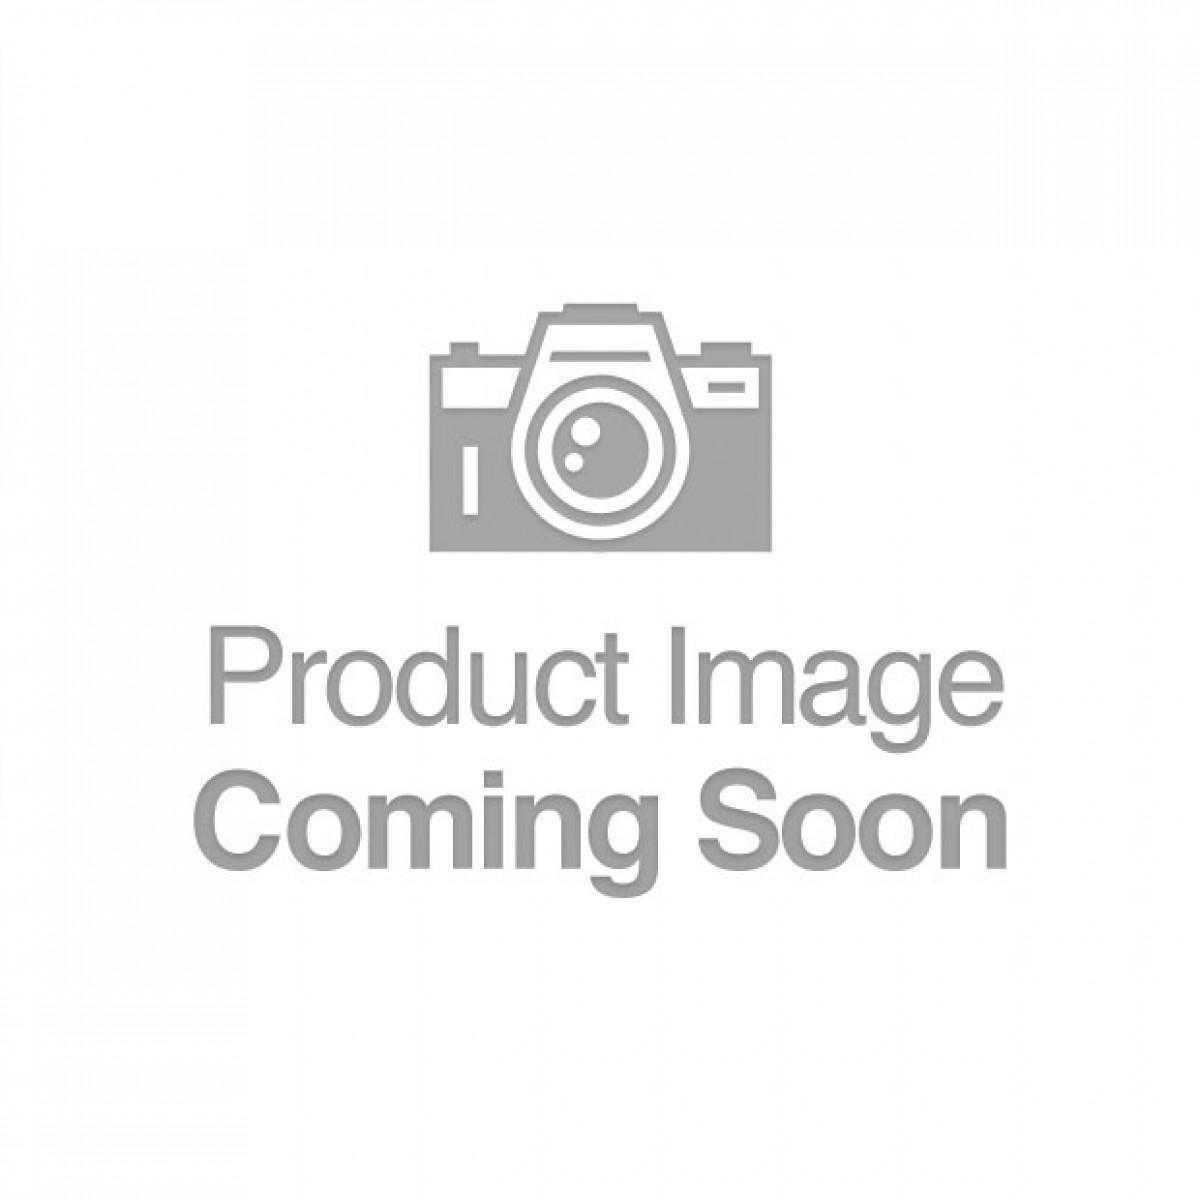 Sensuva Hybrid Personal Moisturizer - 1.93 oz Cotton Candy